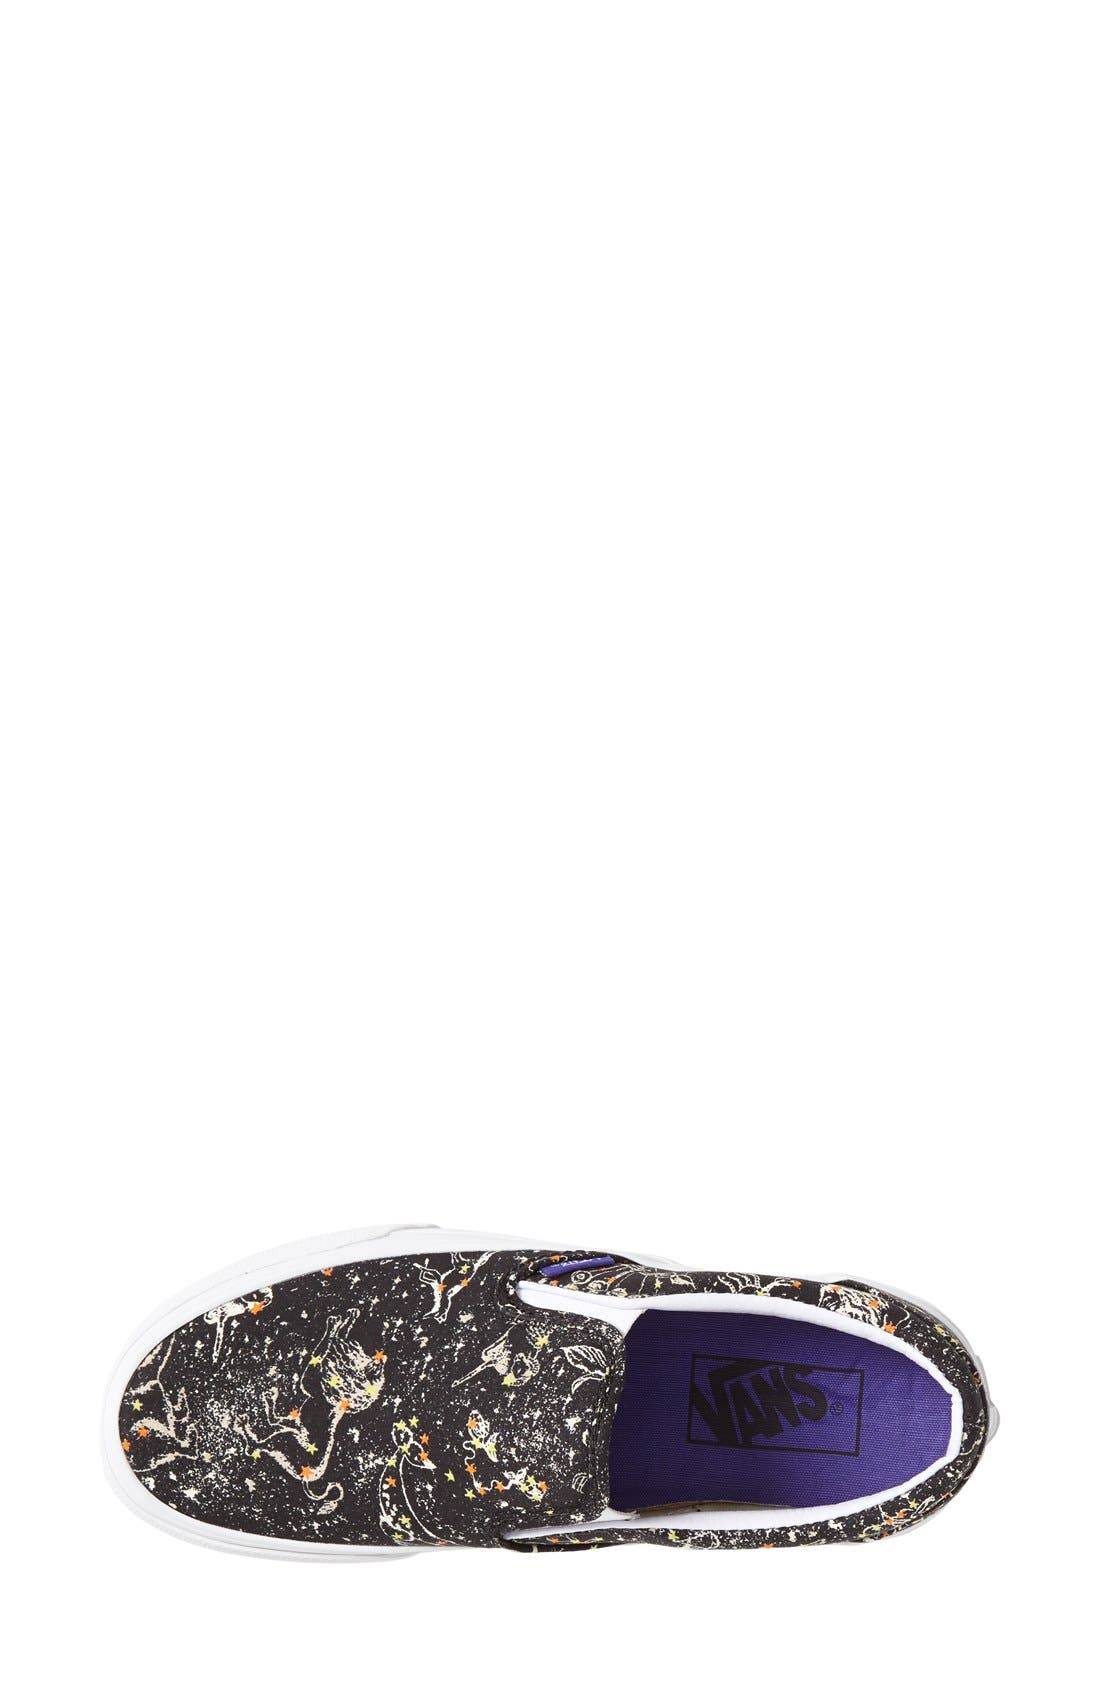 Alternate Image 3  - Liberty x Vans 'Classic' Slip-On Sneaker (Women)